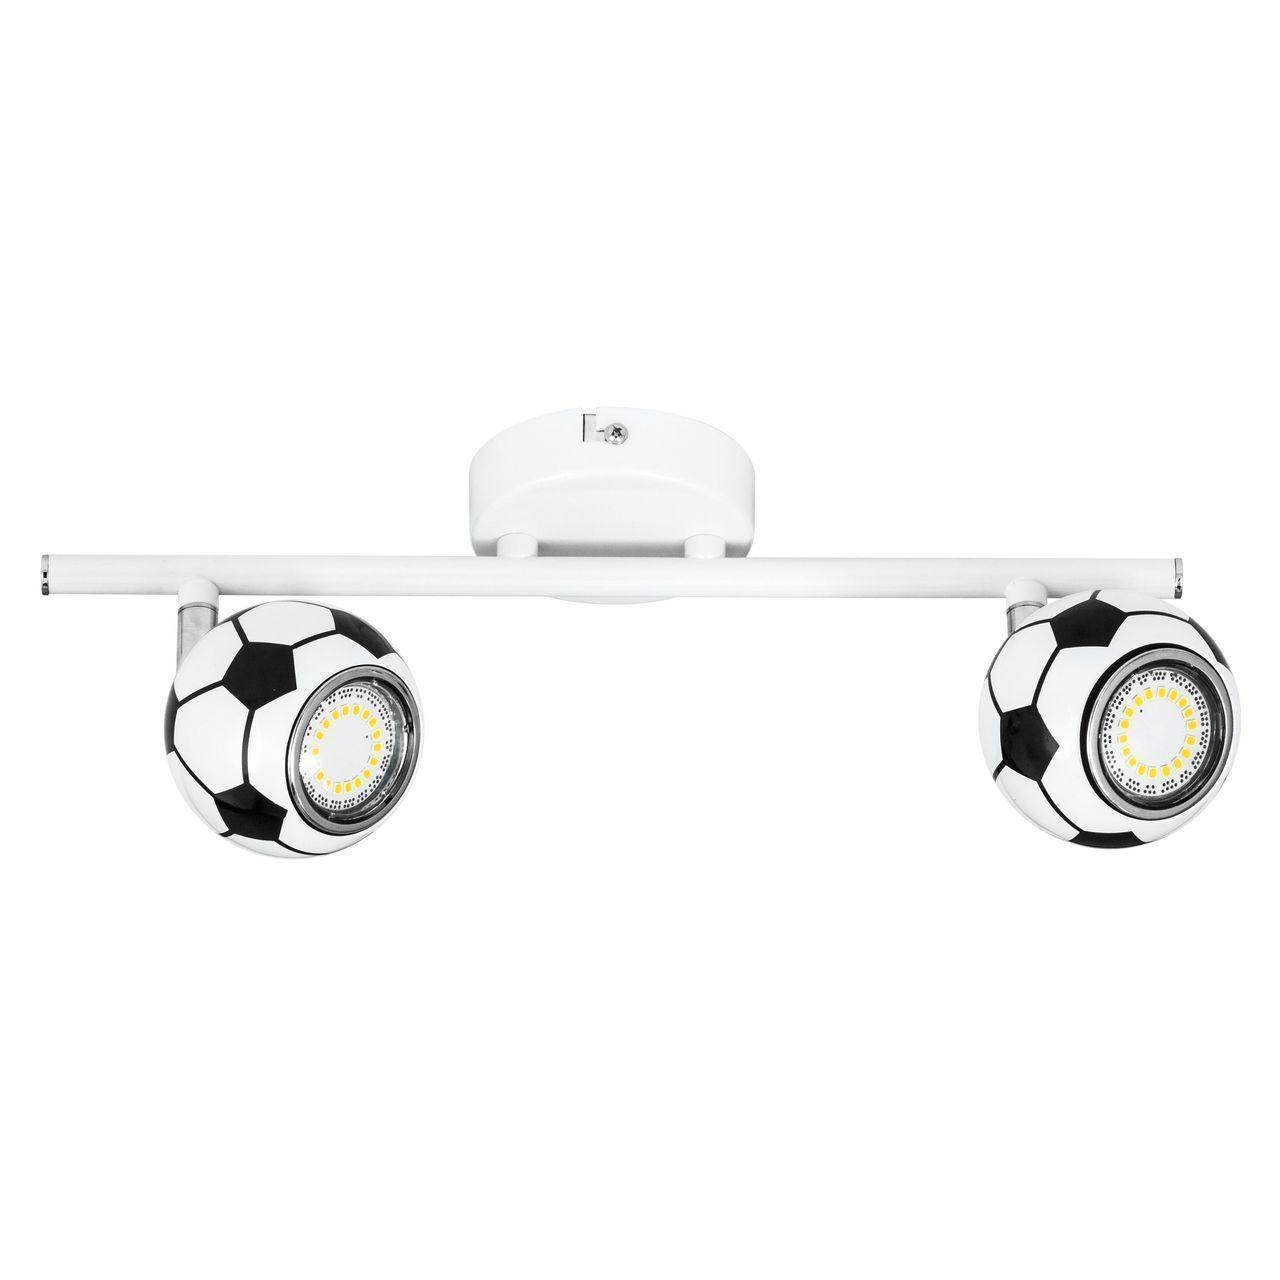 Спот Spot Light Play 2400204 светильник спот spot light classic wood oak 2998170